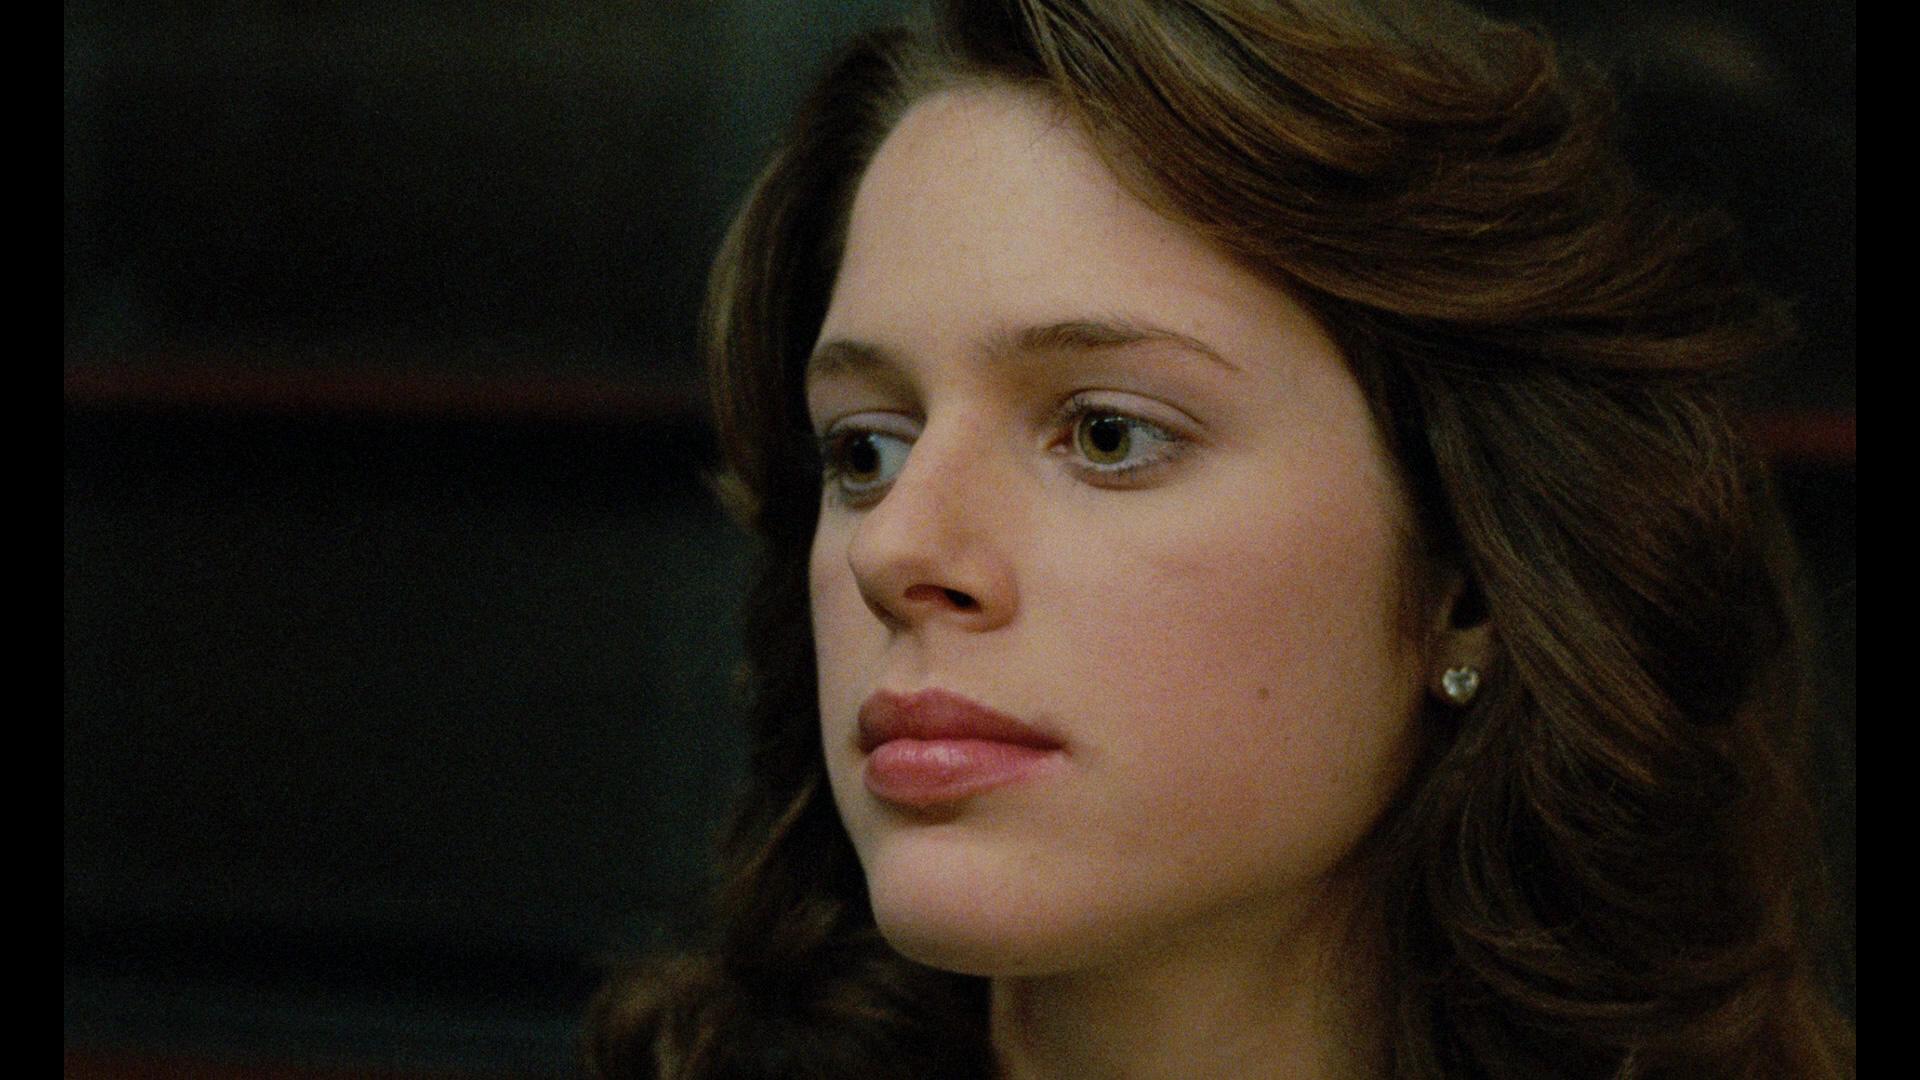 Natasha Hovey (born in Beirut)